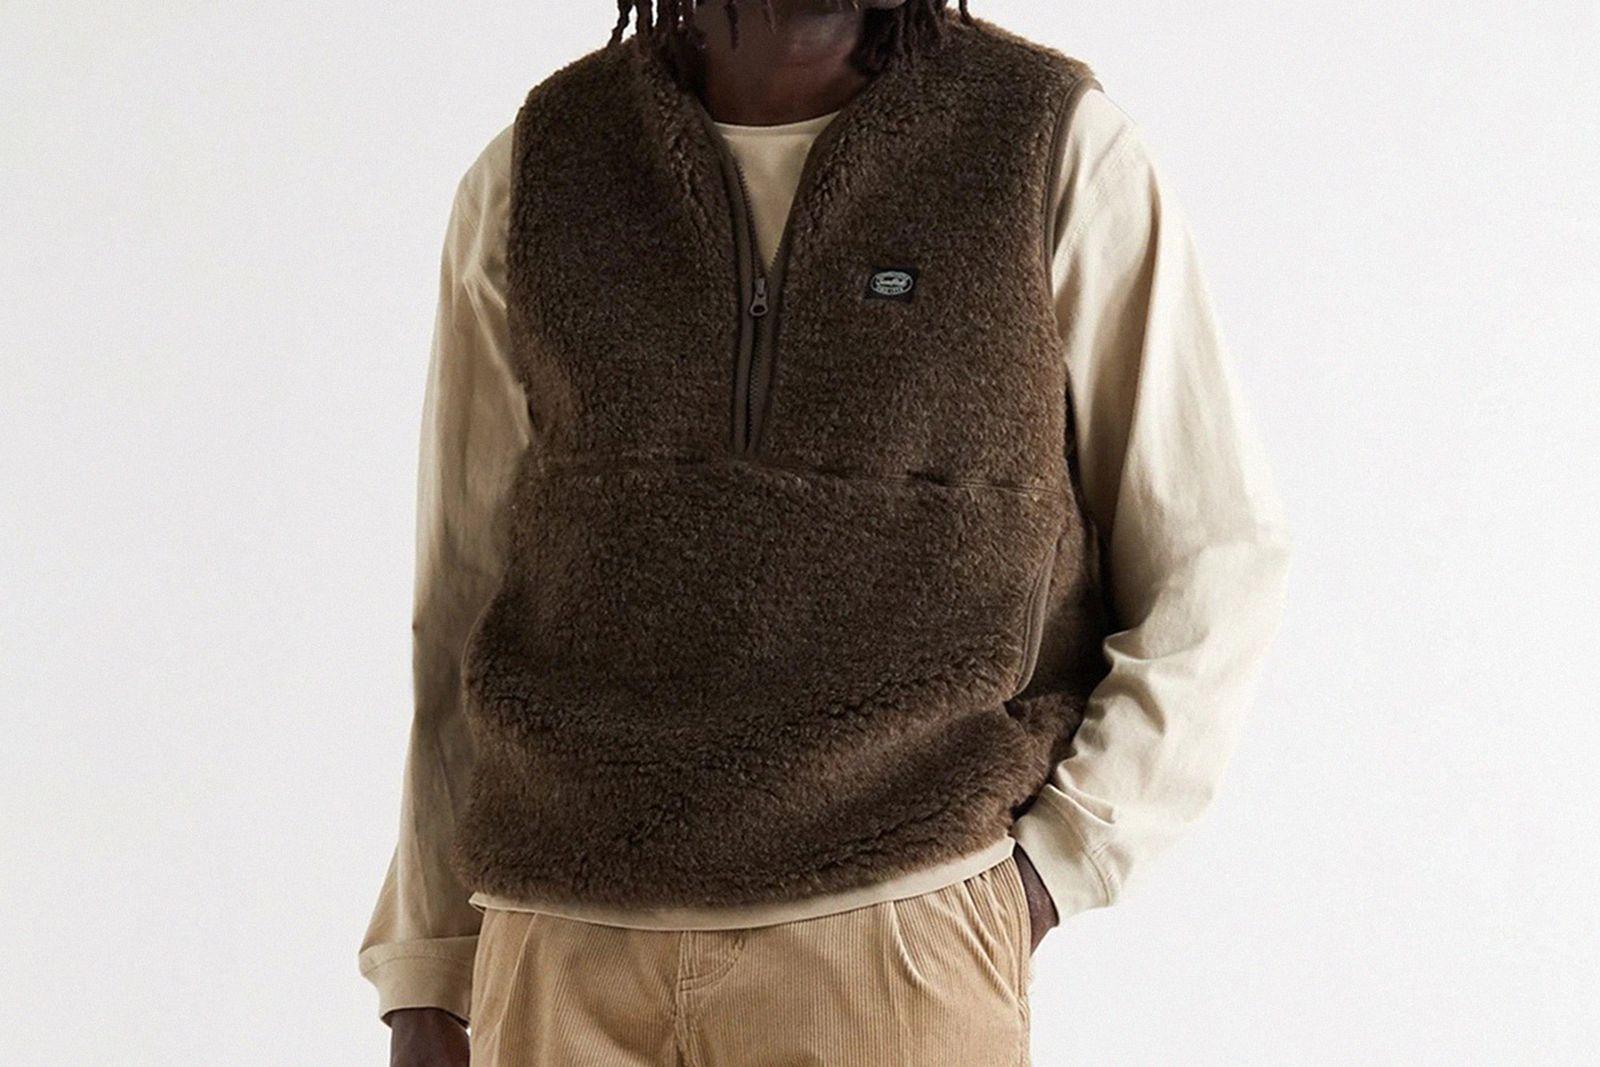 winter vests brown image